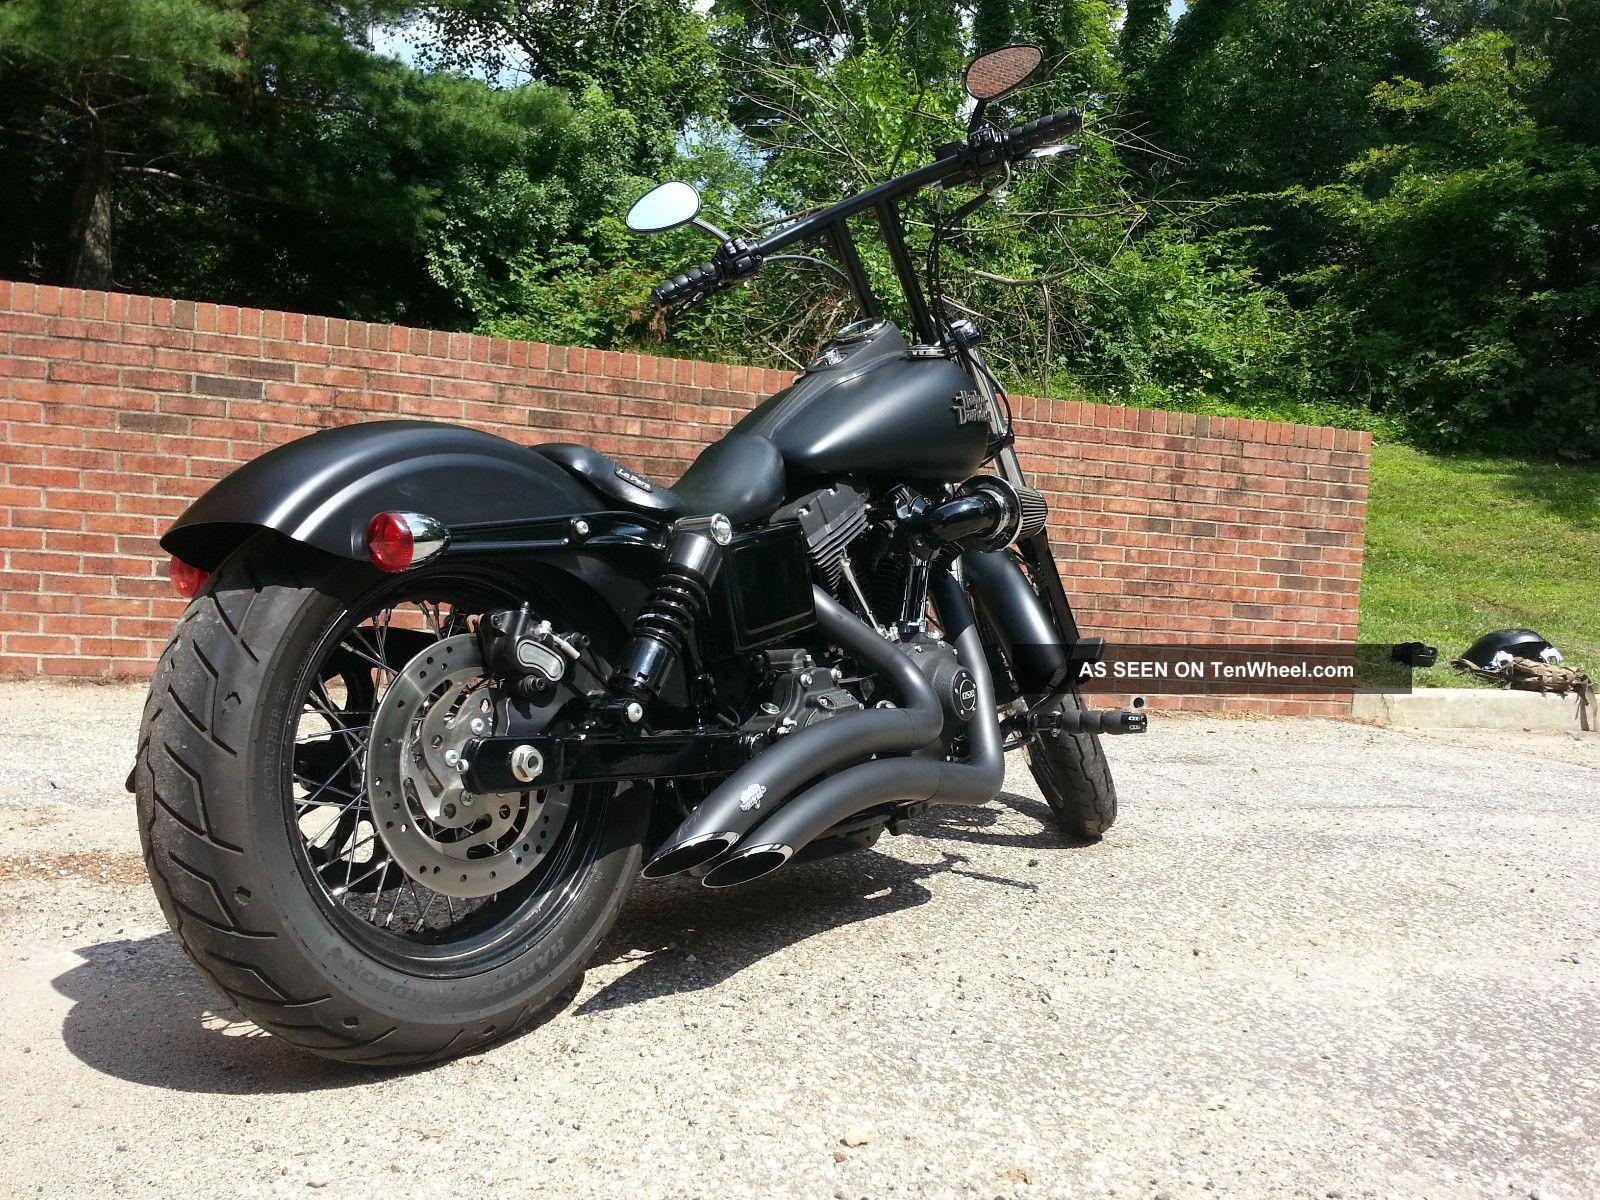 2014 Harley Davidson Dyna Street Bob,  Matte Black Dyna photo